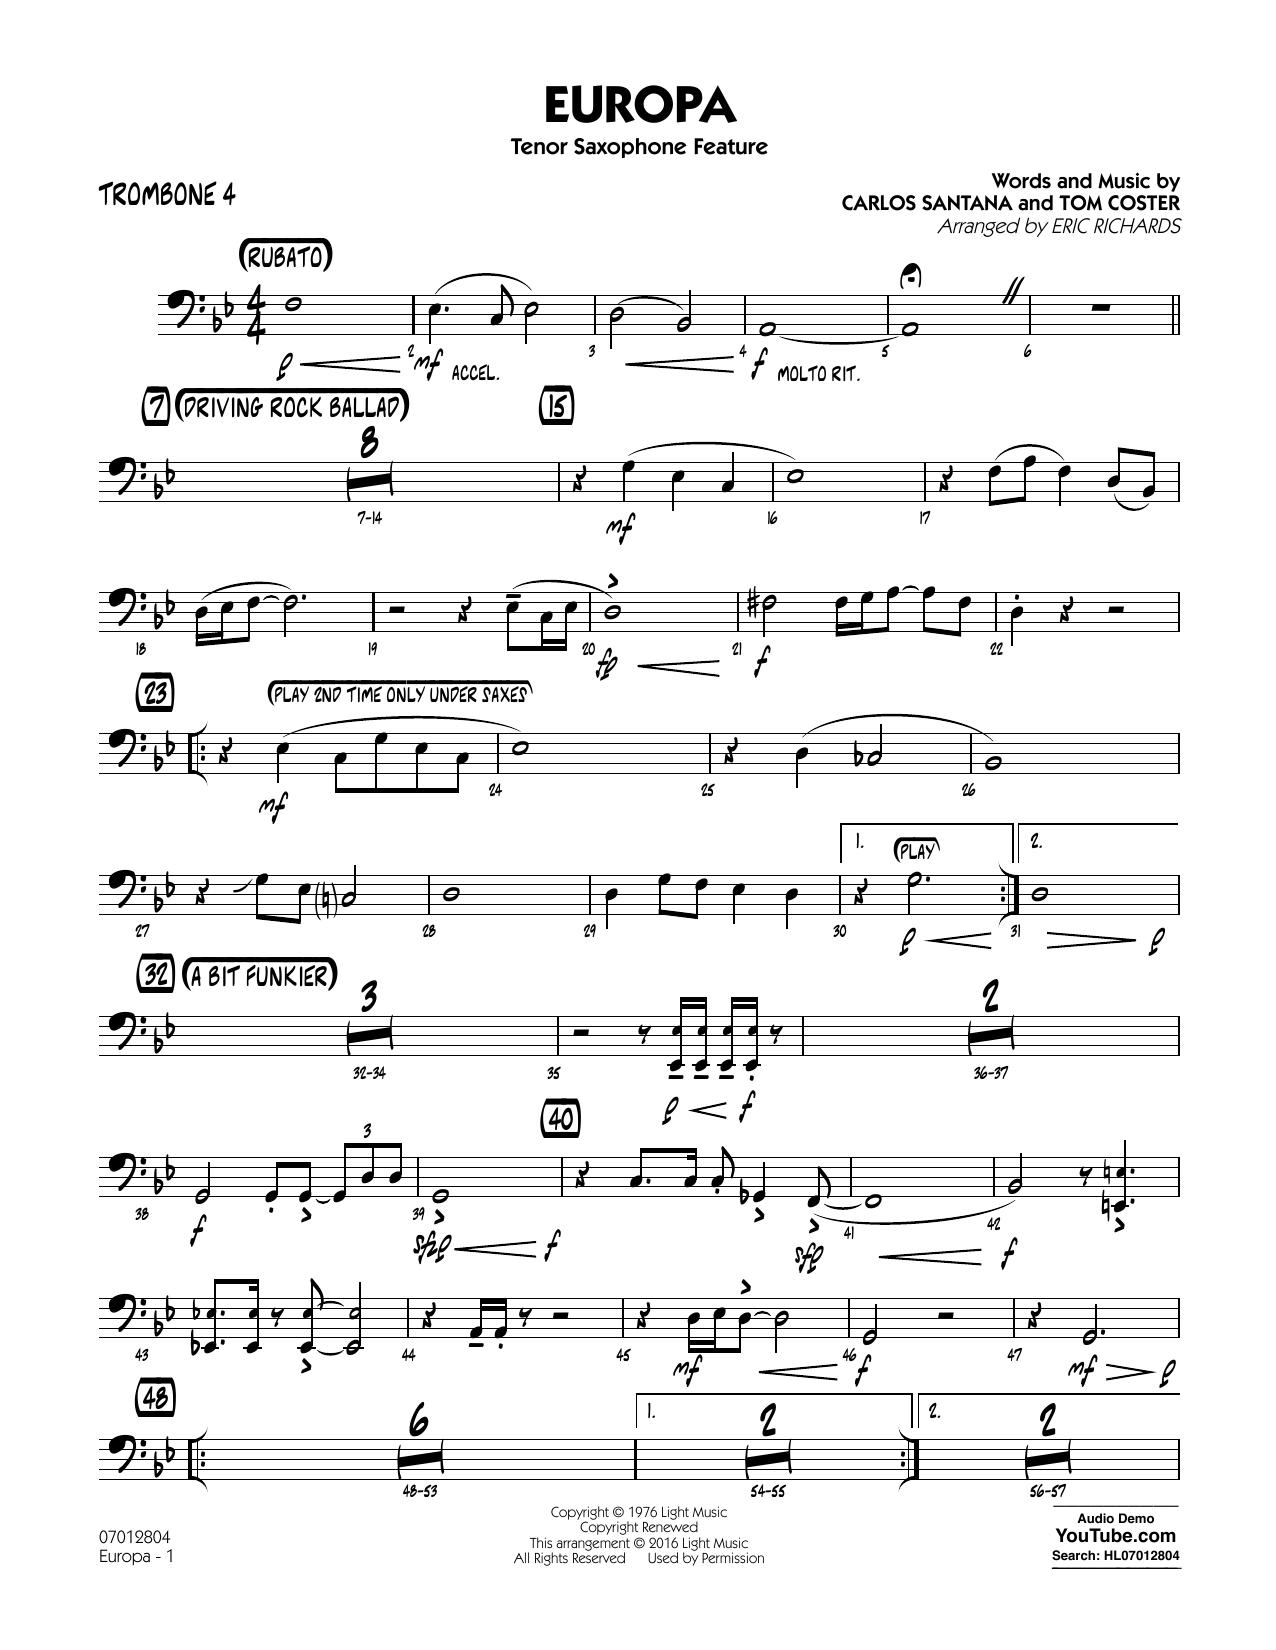 Tom Coster - Europa - Trombone 4